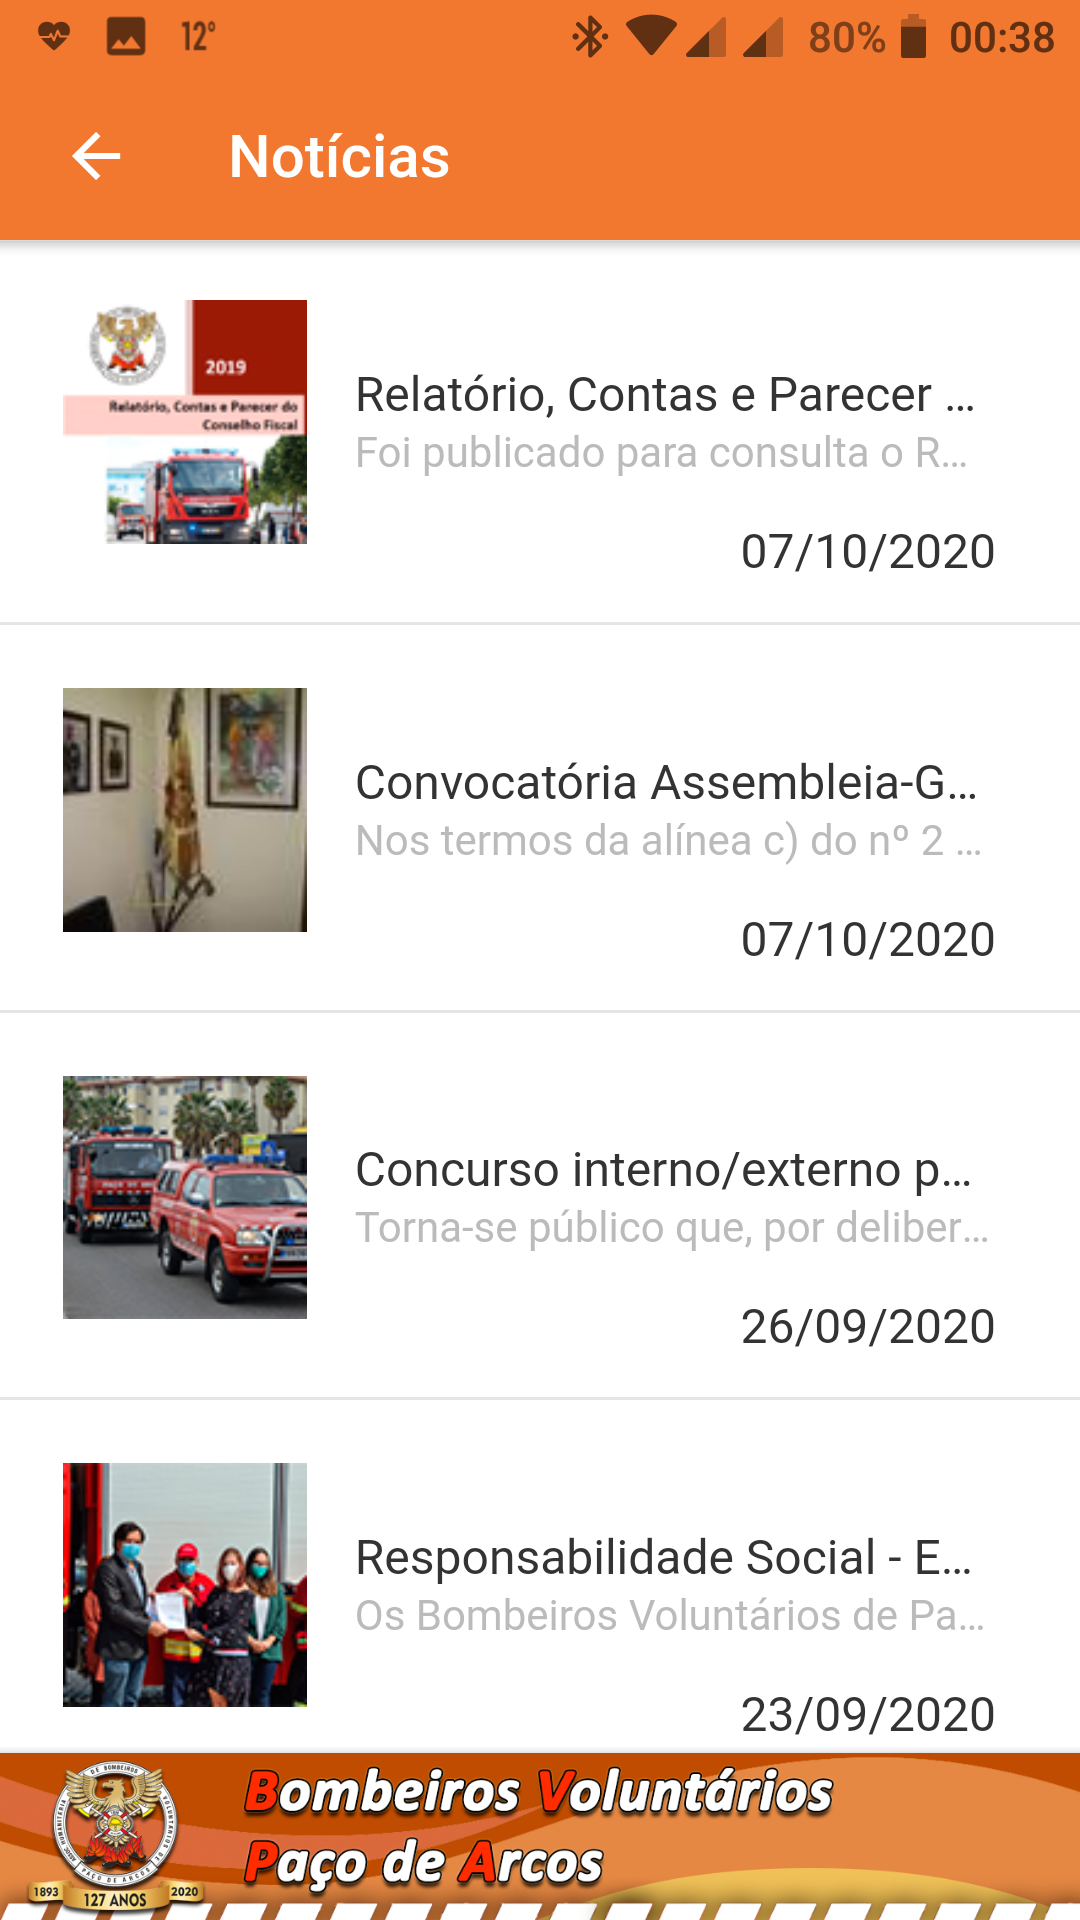 app_bvpacodearcos_20201030 (13)